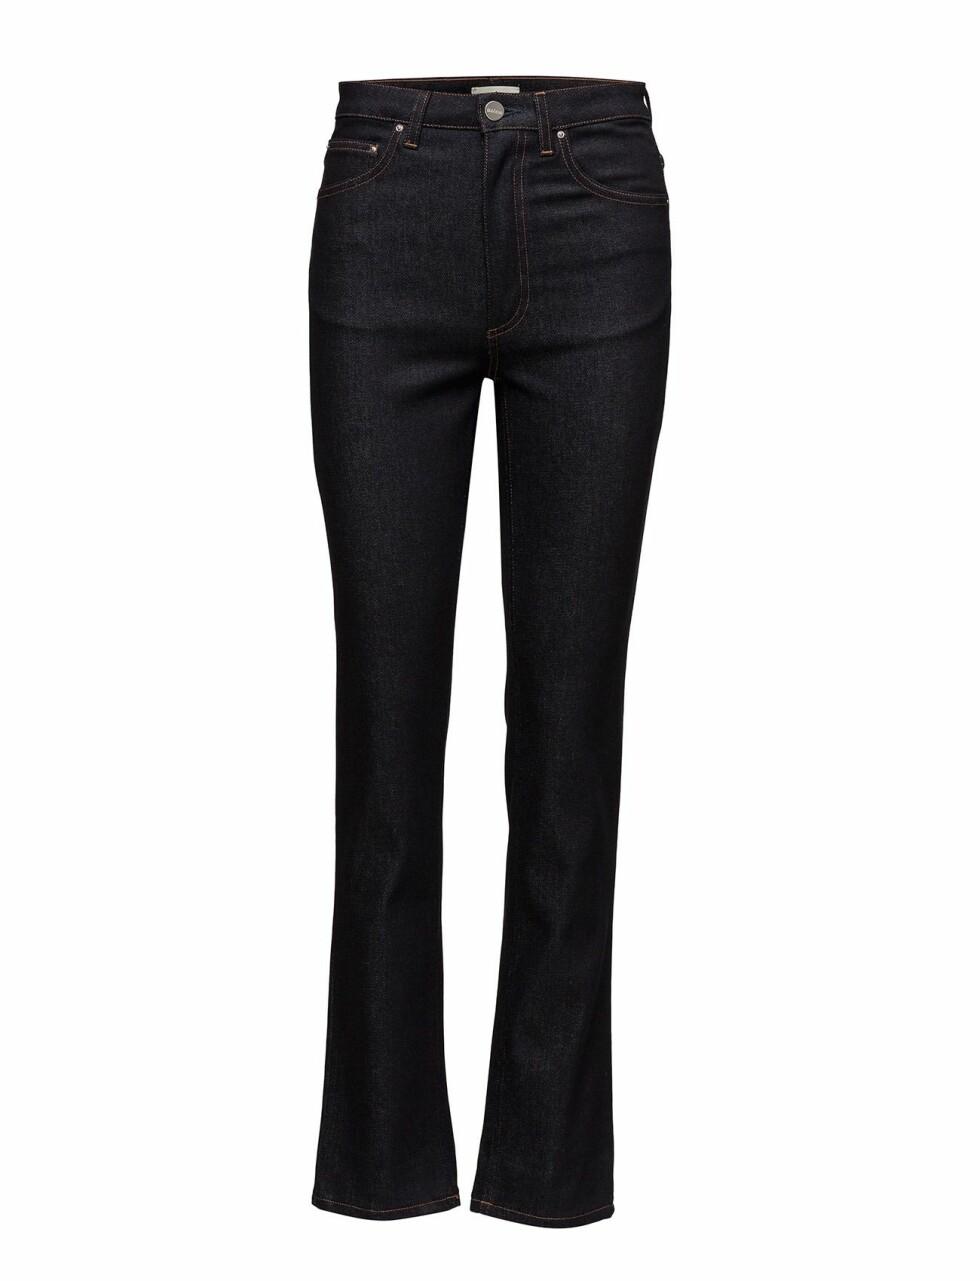 Jeans fra Toteme |1300,-| https://www.boozt.com/no/no/toteme/standard-denim_18328429/18328431?navId=67738&group=listing&position=1000000